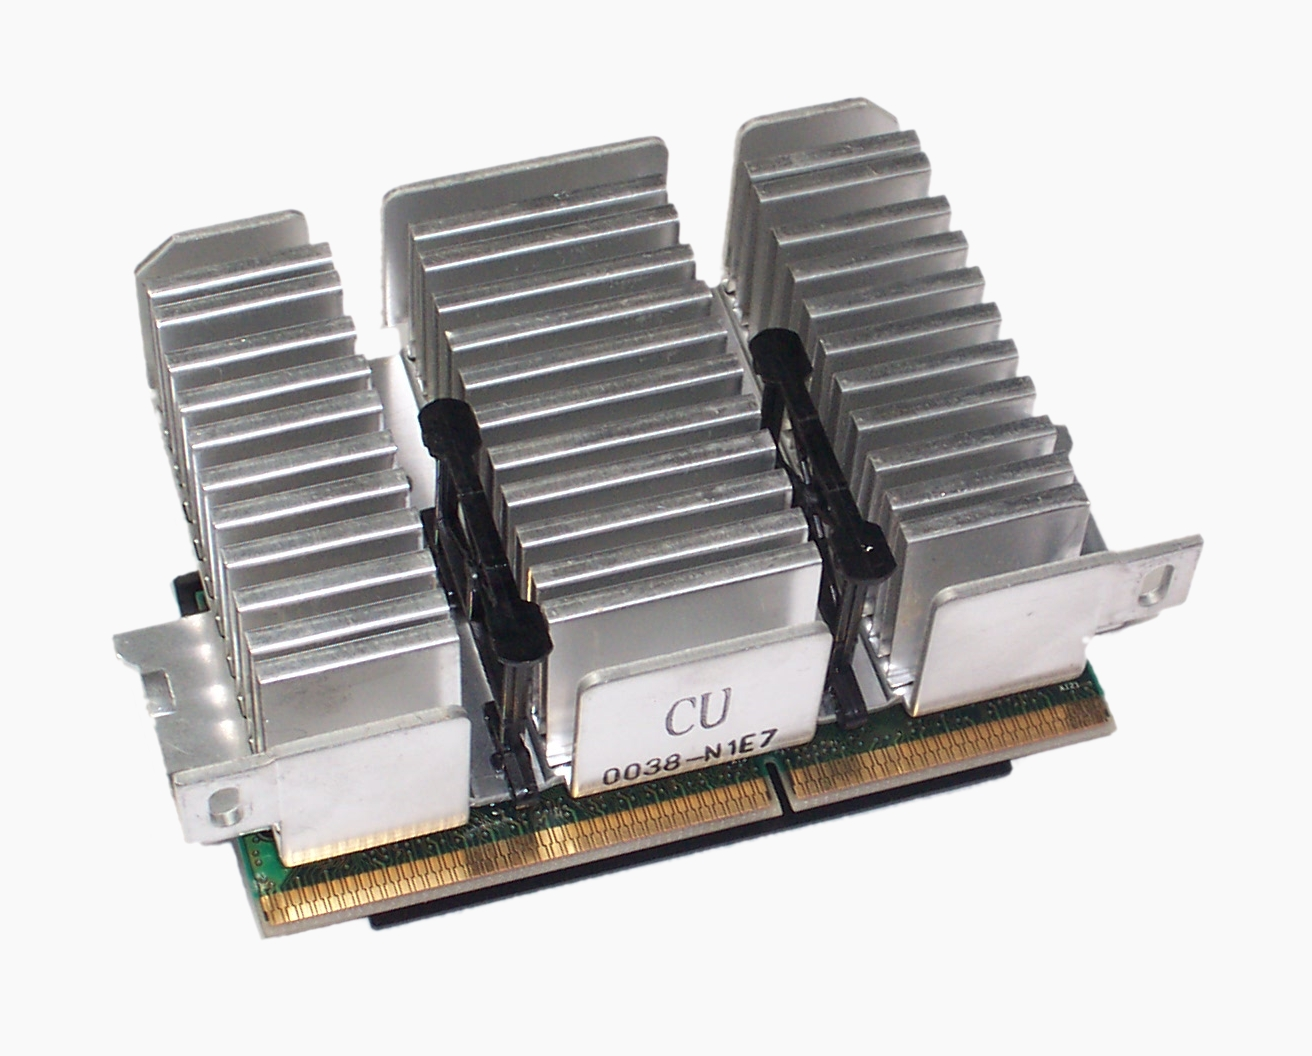 Intel SL4C2 Pentium 3 733MHz Slot 1 Processor with Dell 151VE Heatsink